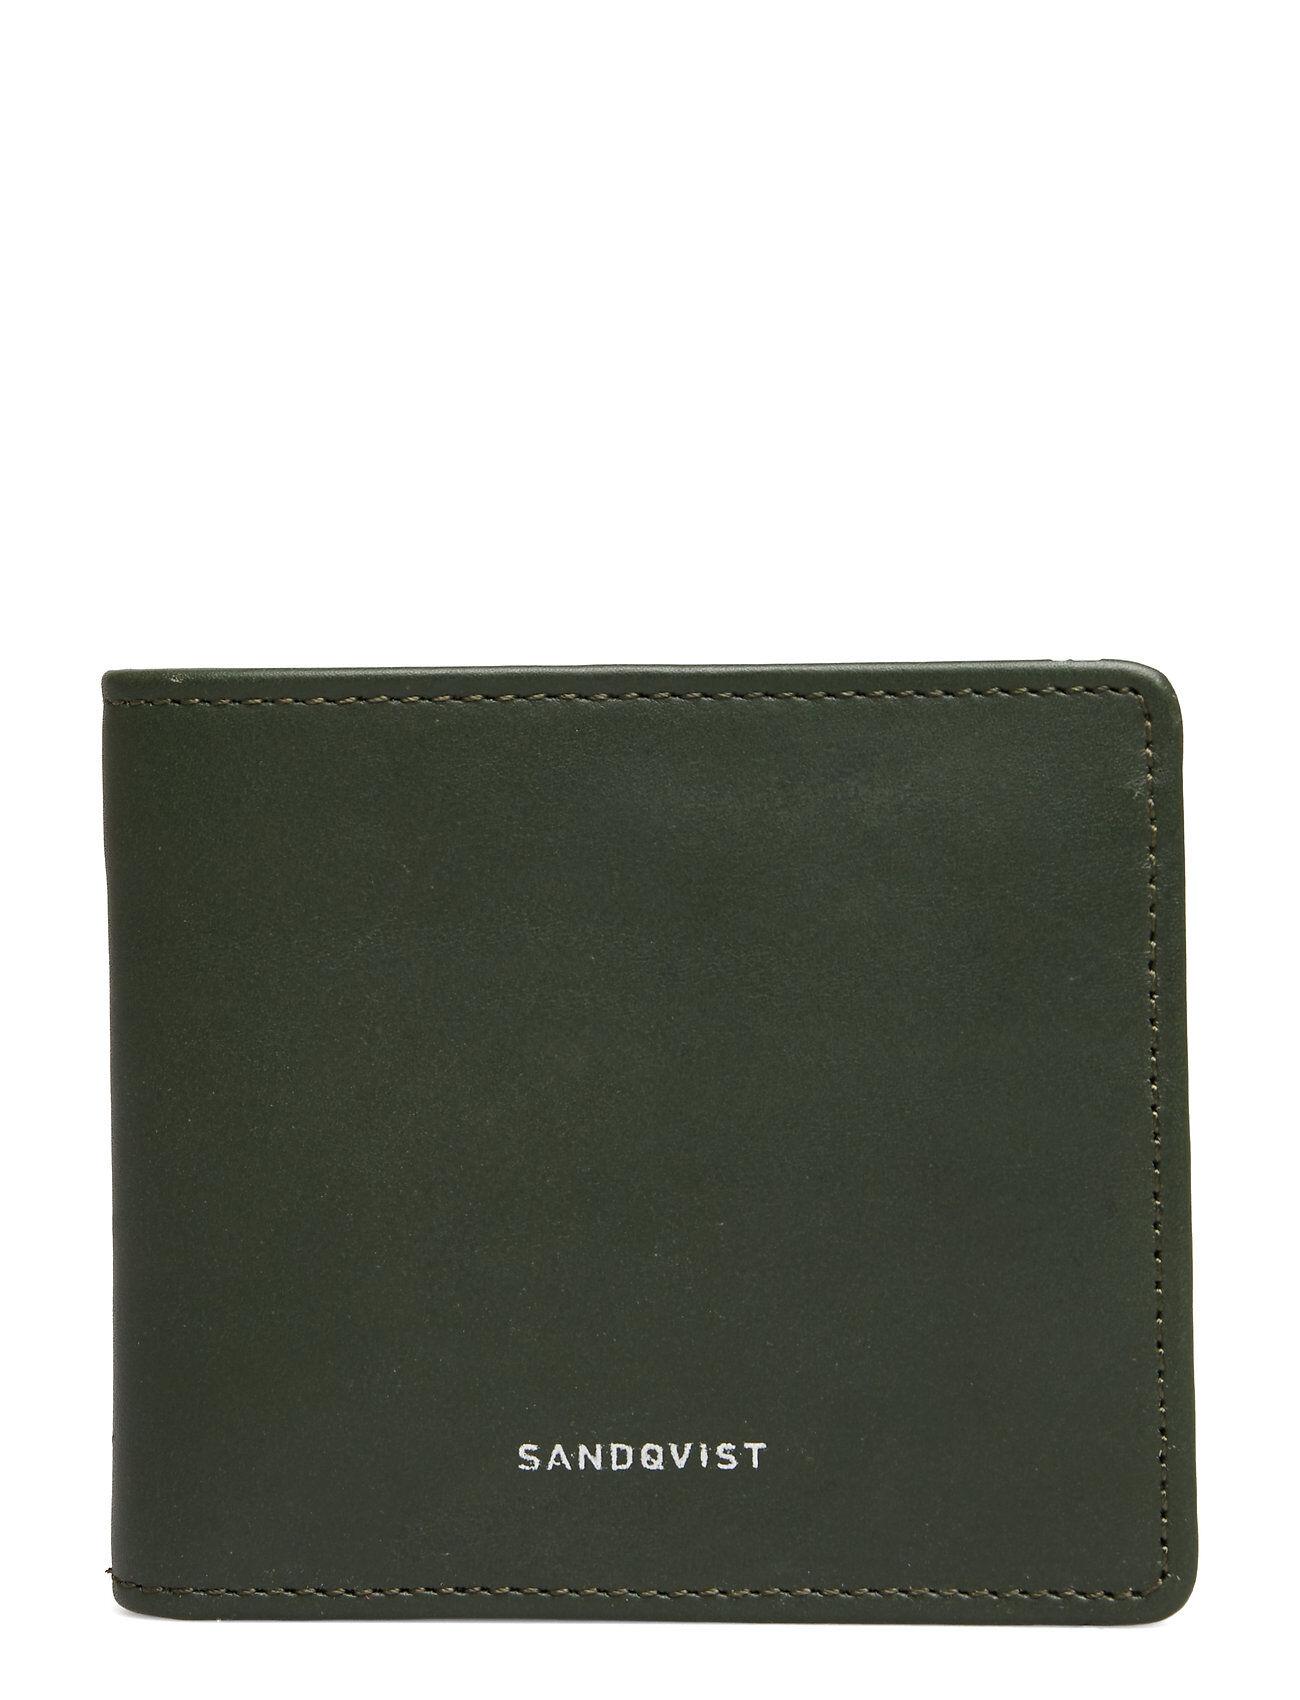 SANDQVIST Manfred